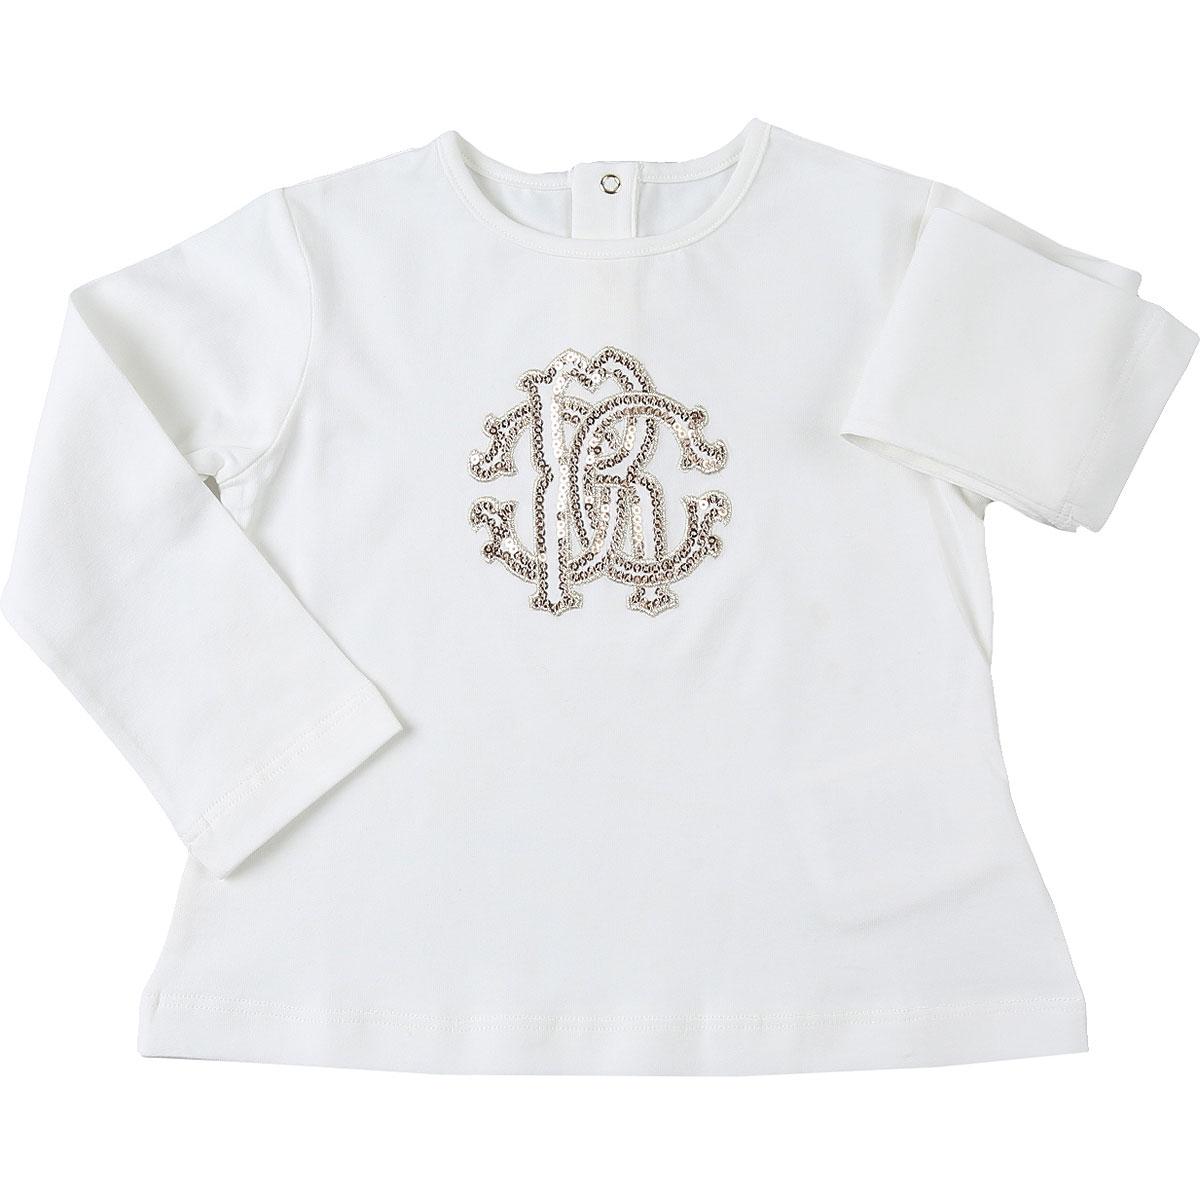 Roberto Cavalli Baby T-Shirt for Girls On Sale, Cream, Cotton, 2019, 12M 18M 2Y 3Y